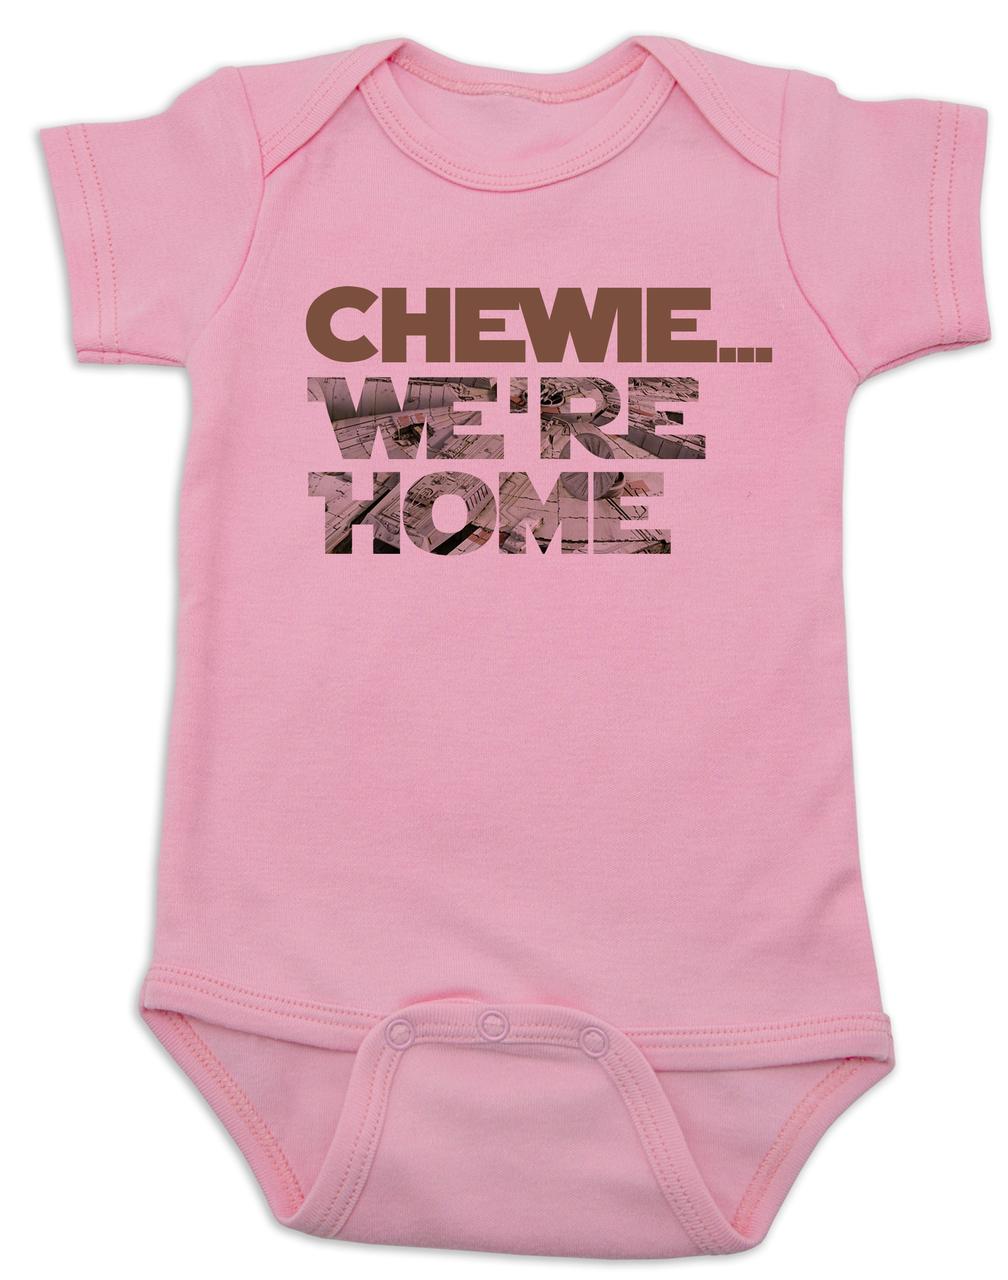 Star Wars Onesie Bodysuit Shirt Funny Shower Gift Chewbacca I Woke Up Like This